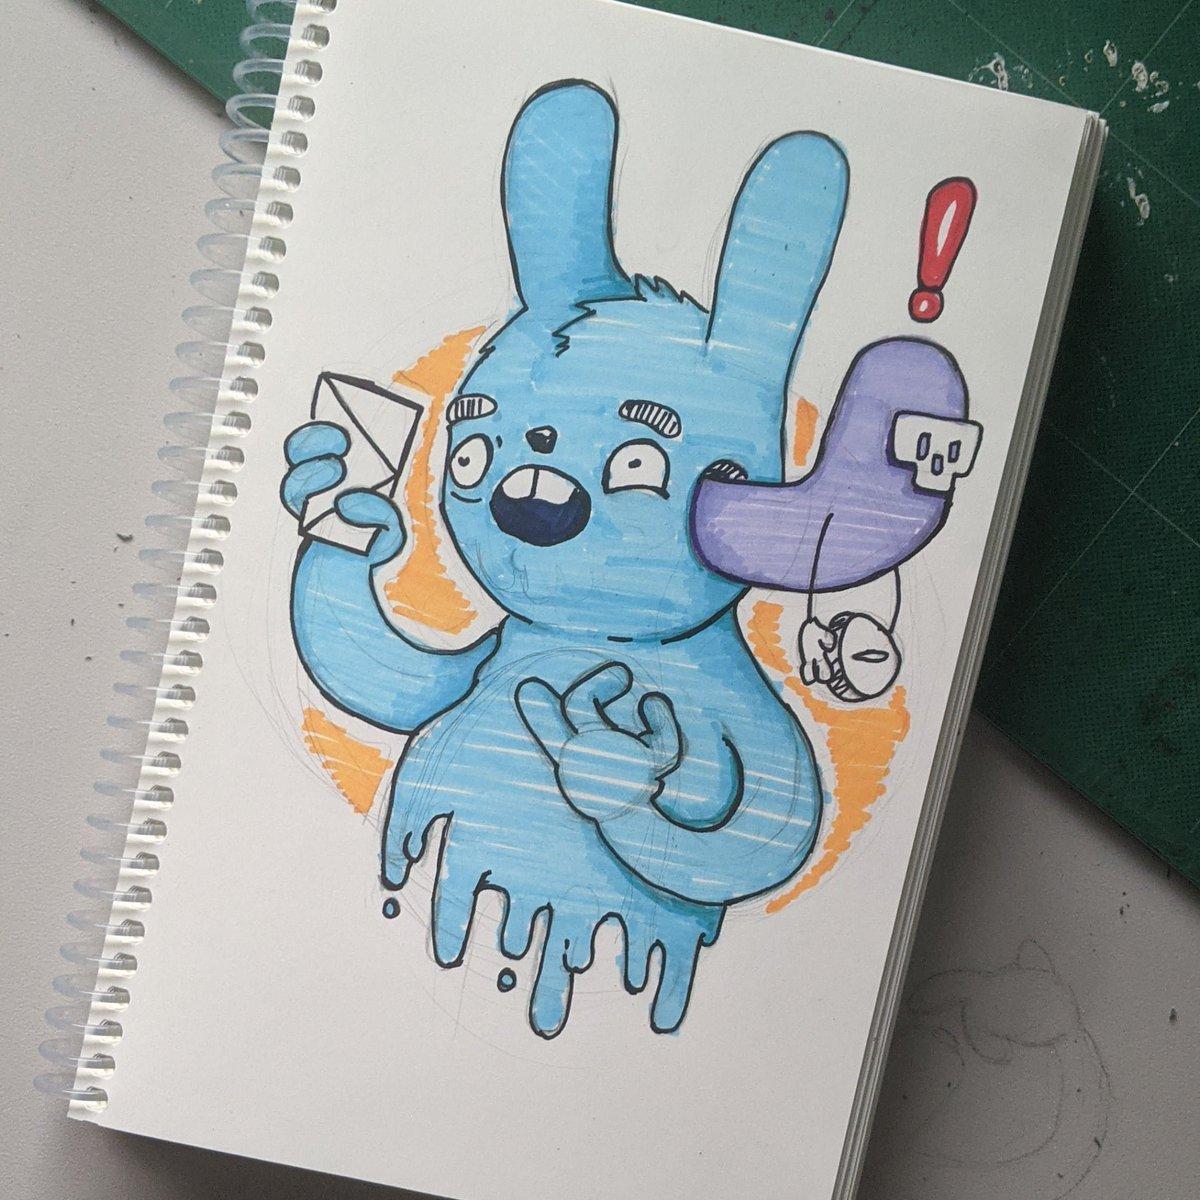 Daily Doodle Day 311 #artwork #sketchbook #drawings #artist #creepyart #skateboard  #art_dailydose #computer #pendrawing #gamedev #creativeart #illustrator #logodesigner #pencilsketch #inkdrawing #darkart #dailydoodle #spraypaint #bunny #lowbrowart #skull #noeffort